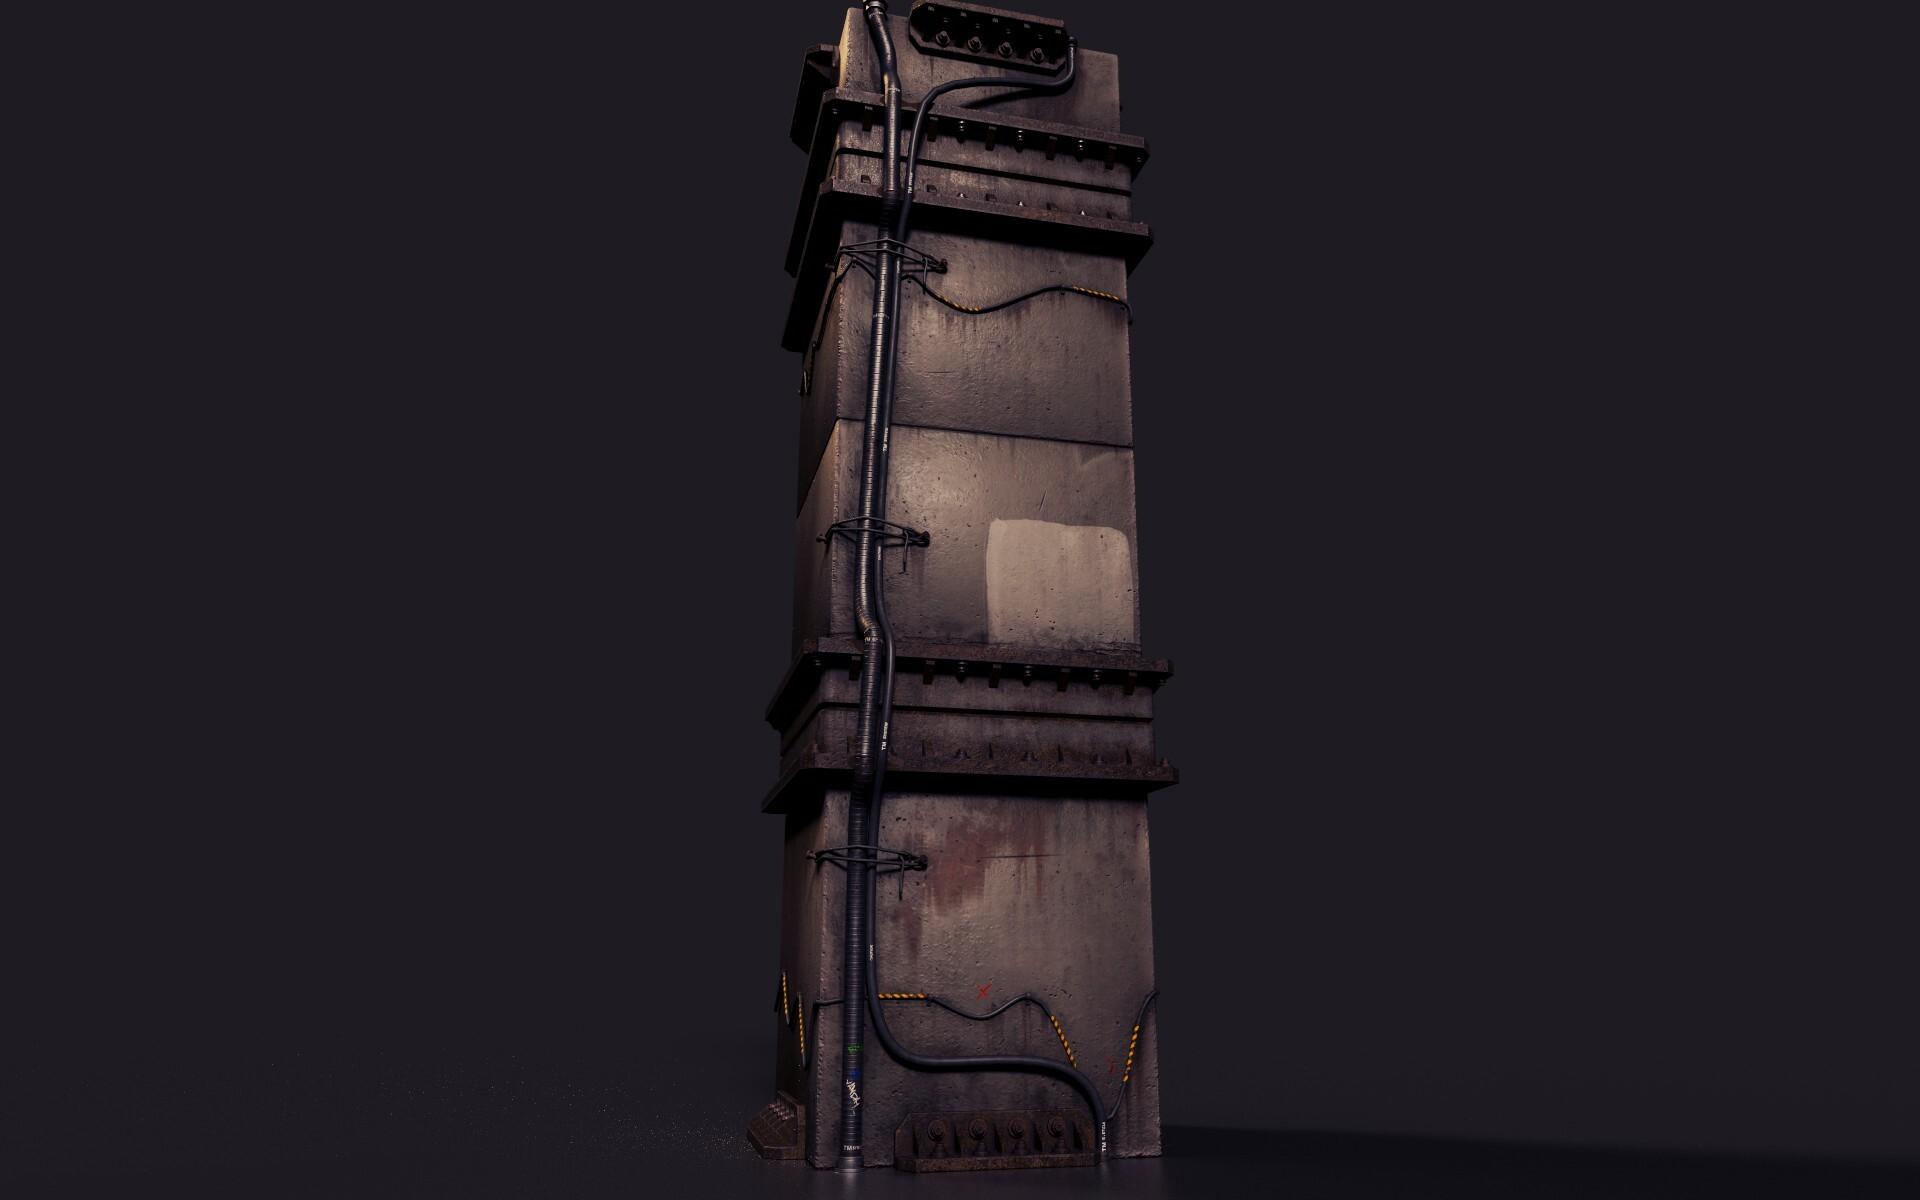 axel suzanne sc pillar01